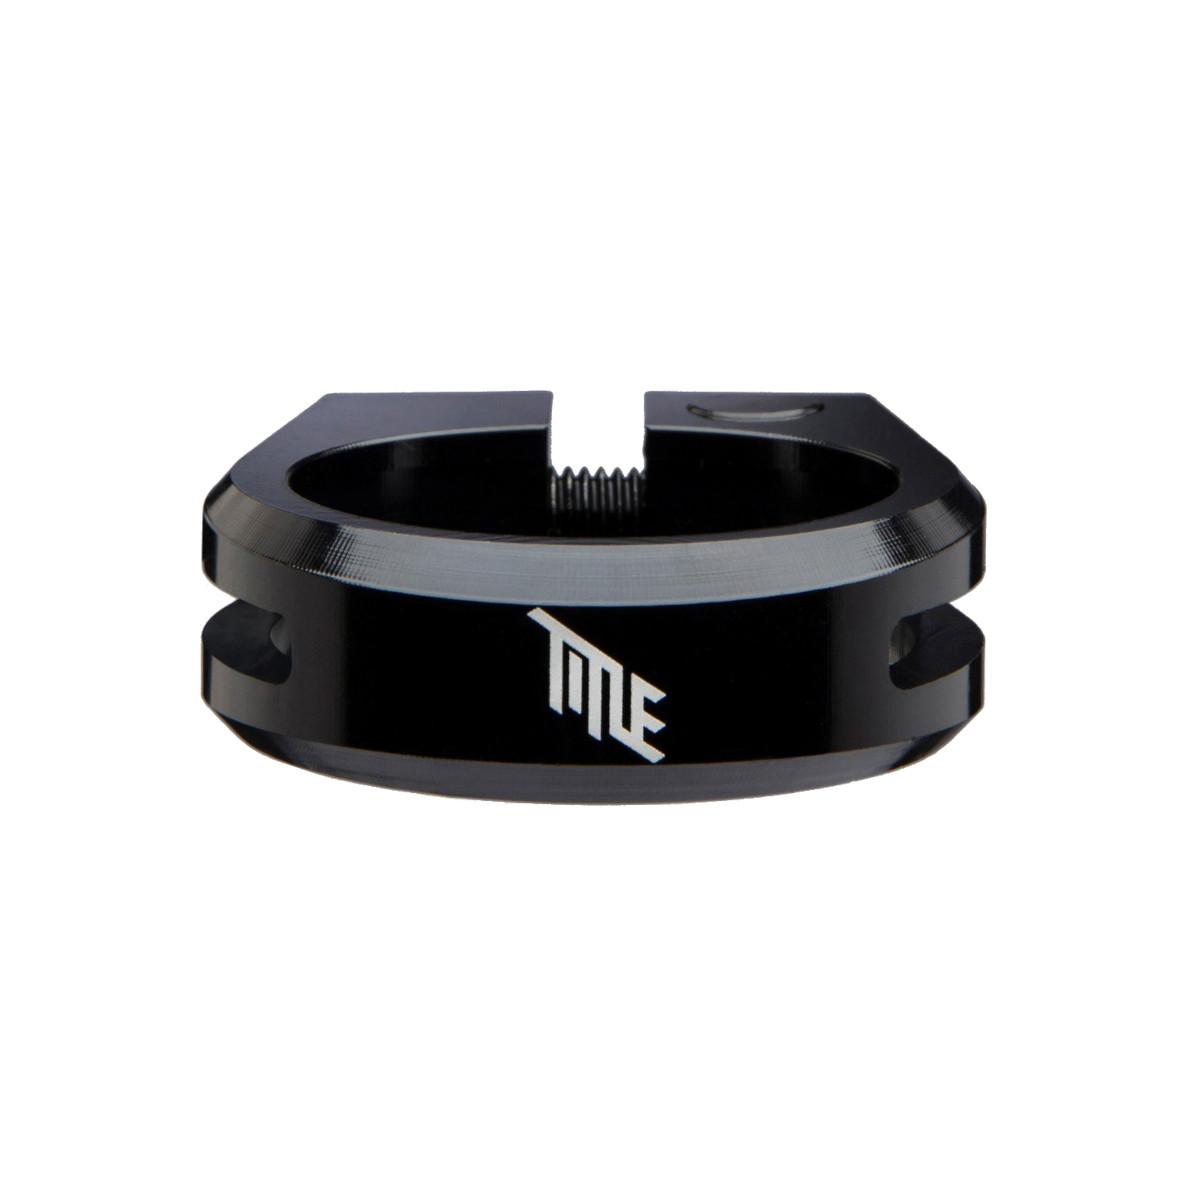 Title MTB Seatpost Clamp - 28.6mm